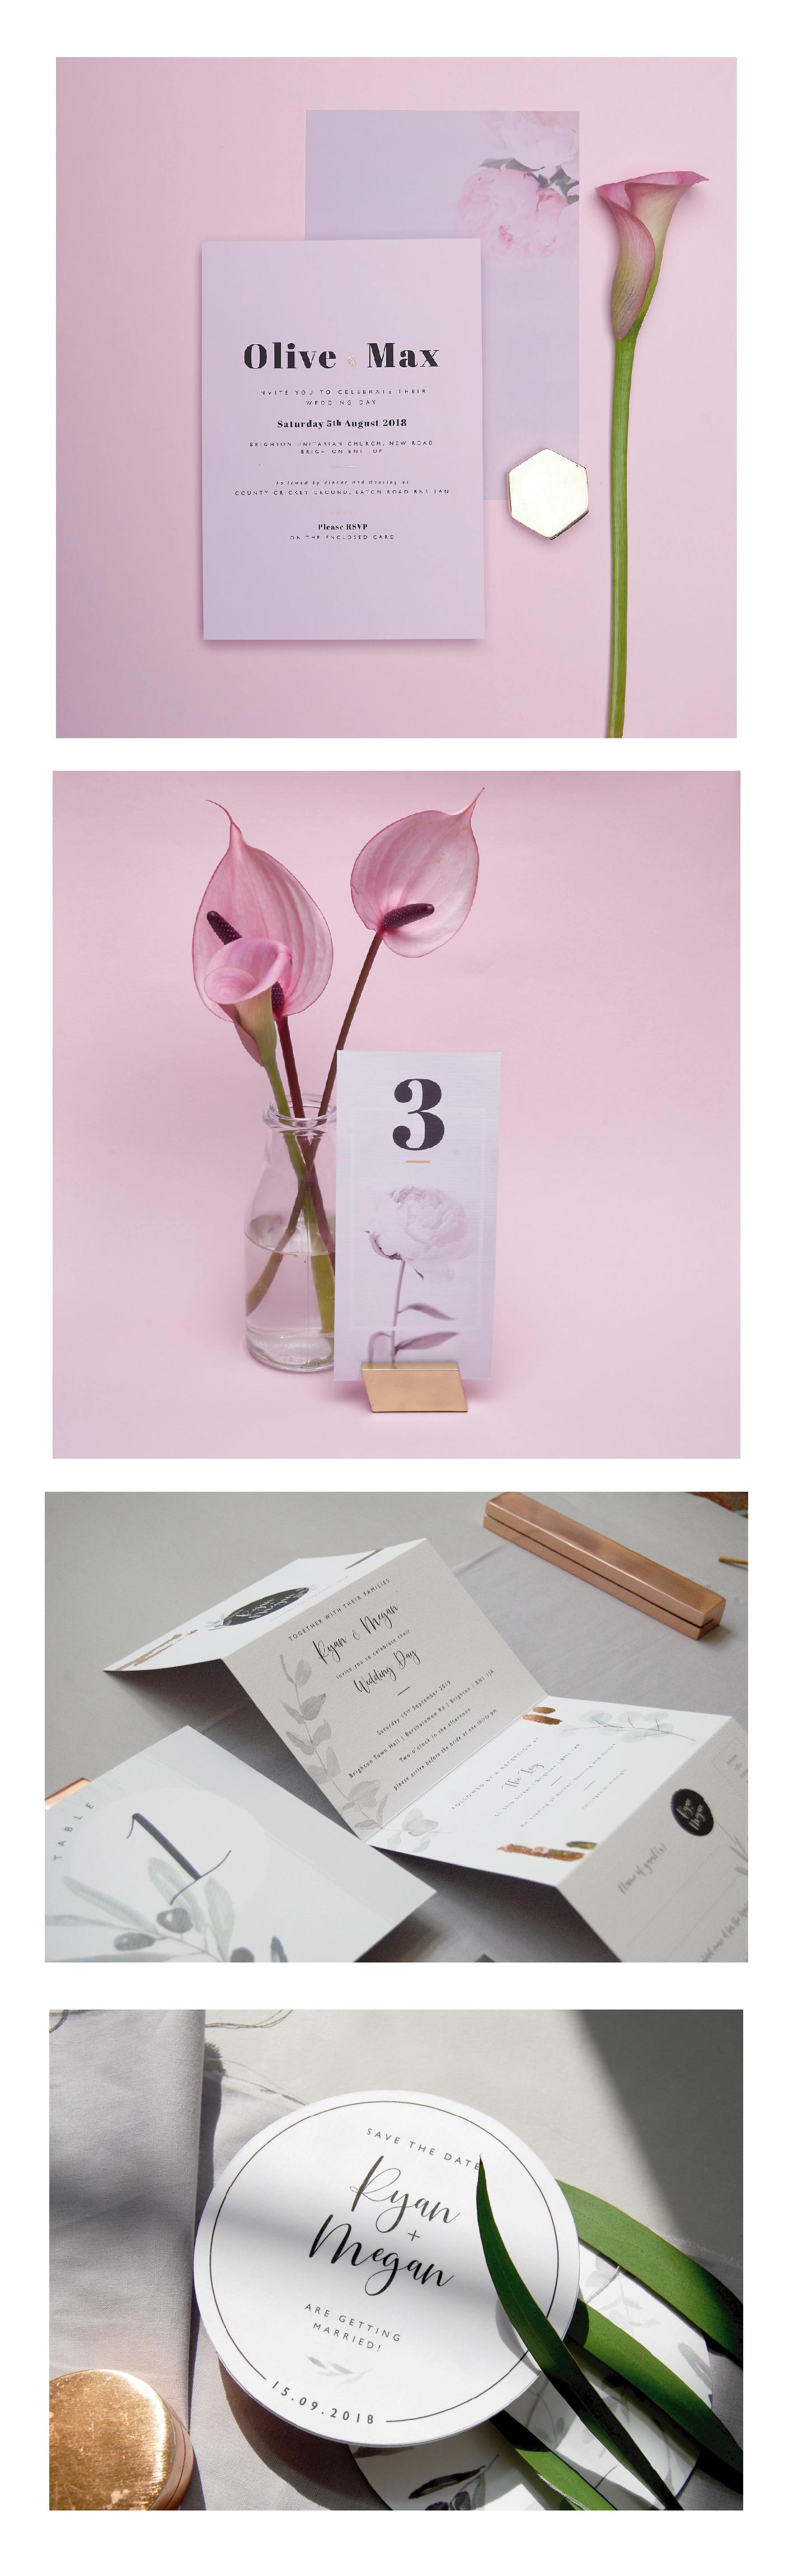 templates-10.jpg